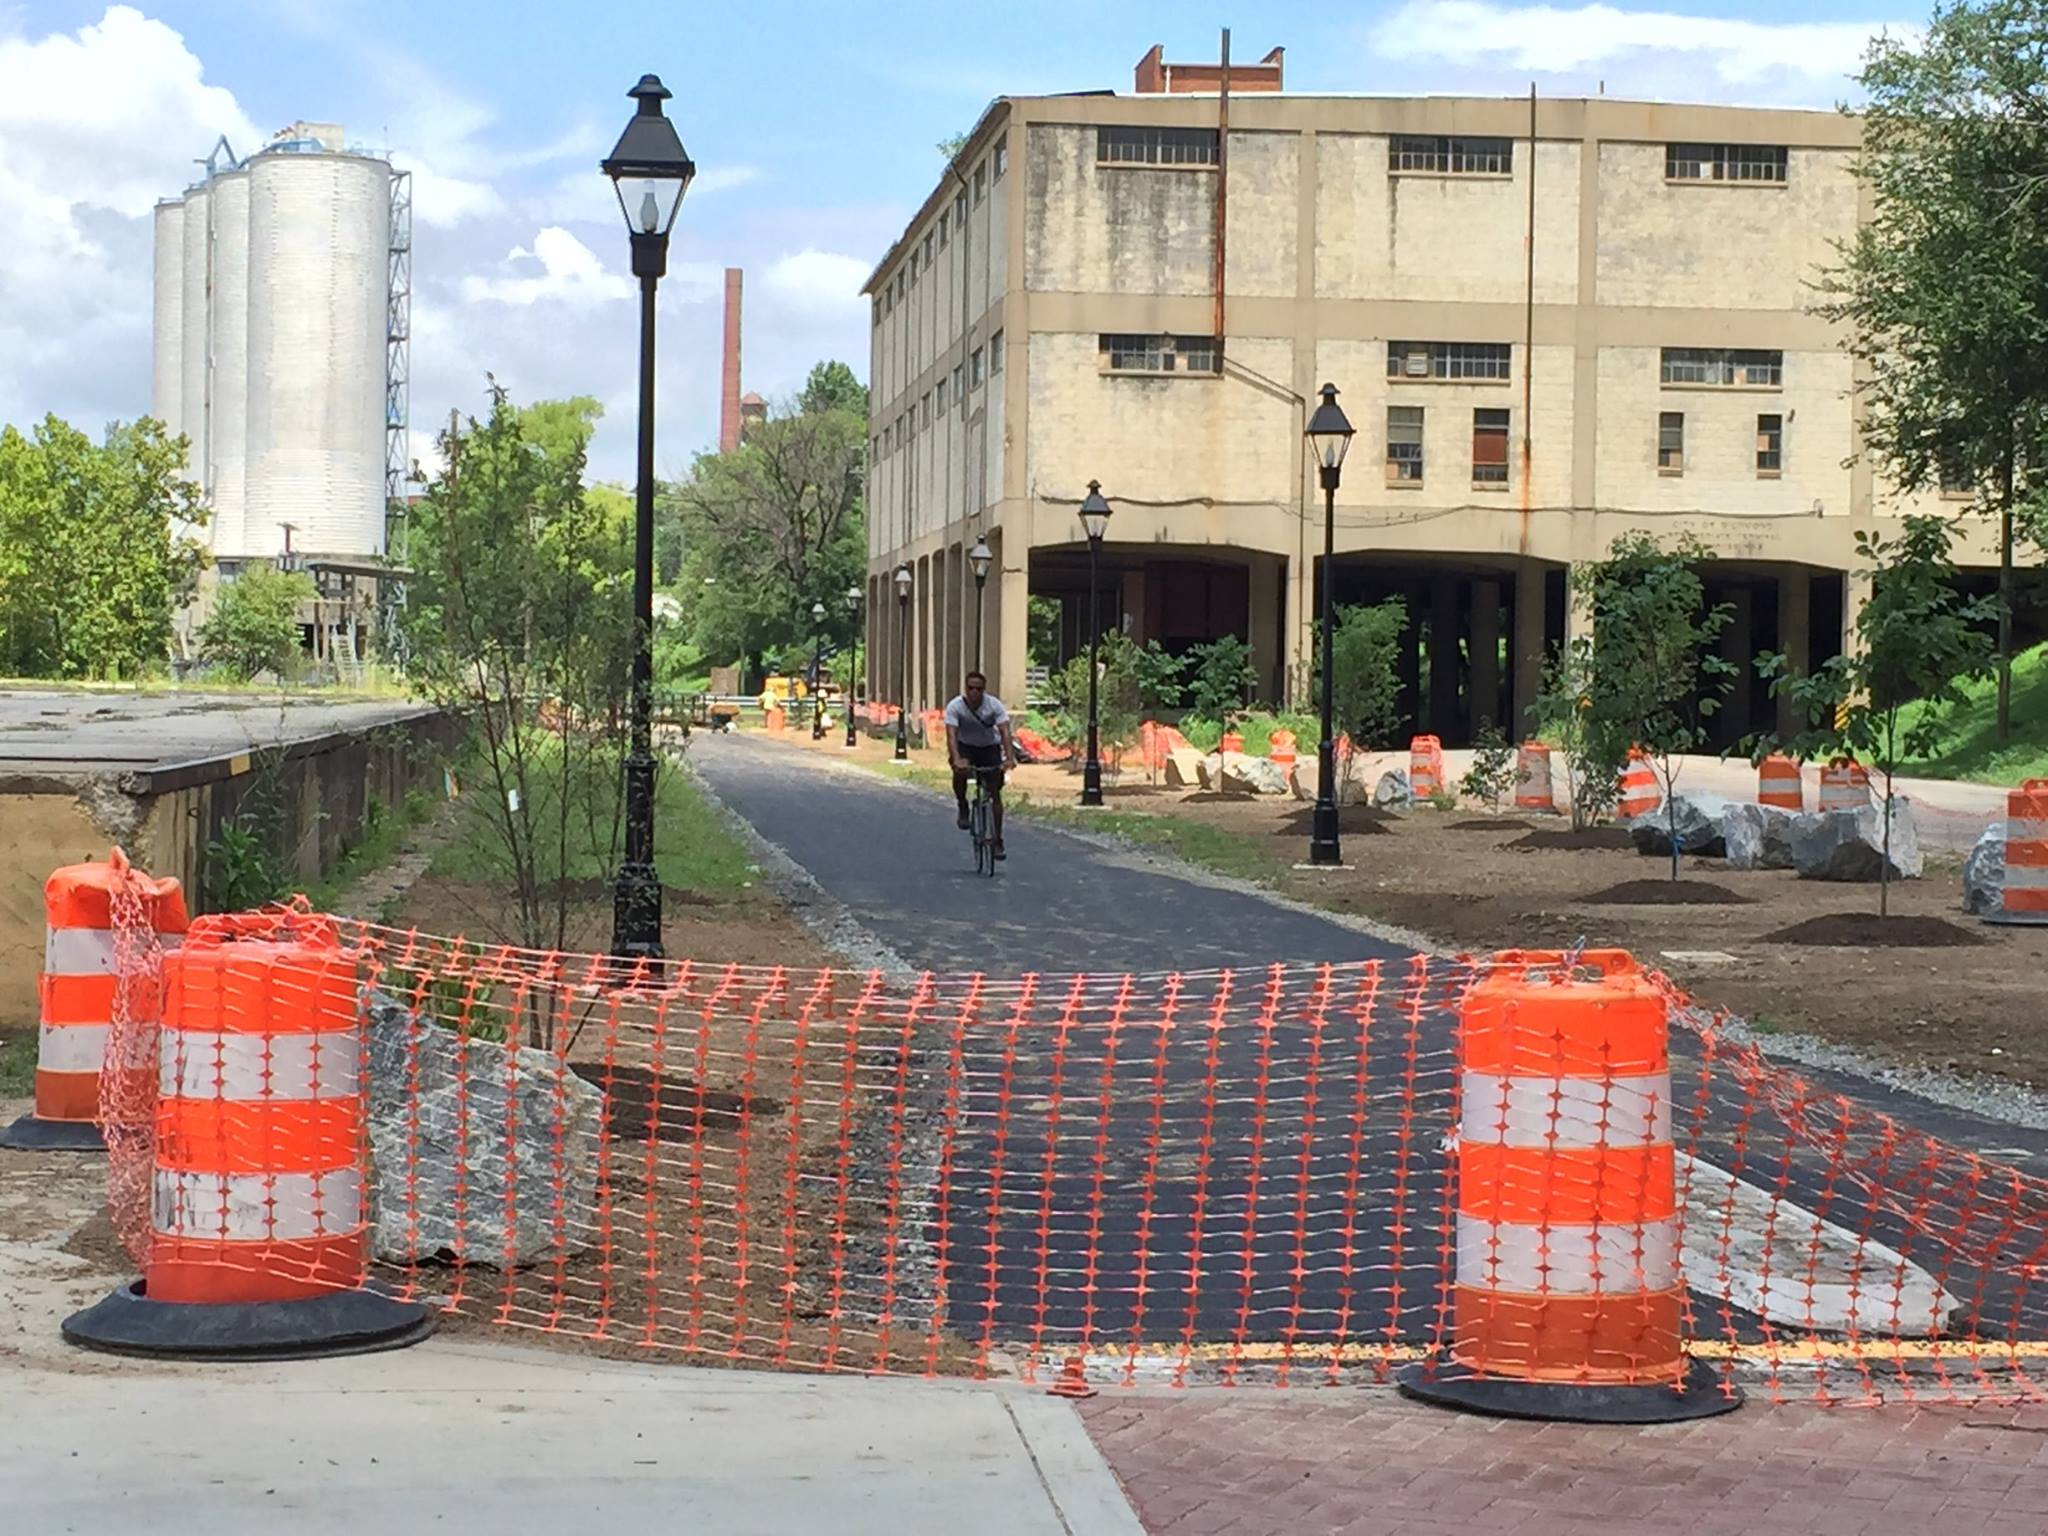 Lehigh Cement silos coming down next month - CHPN